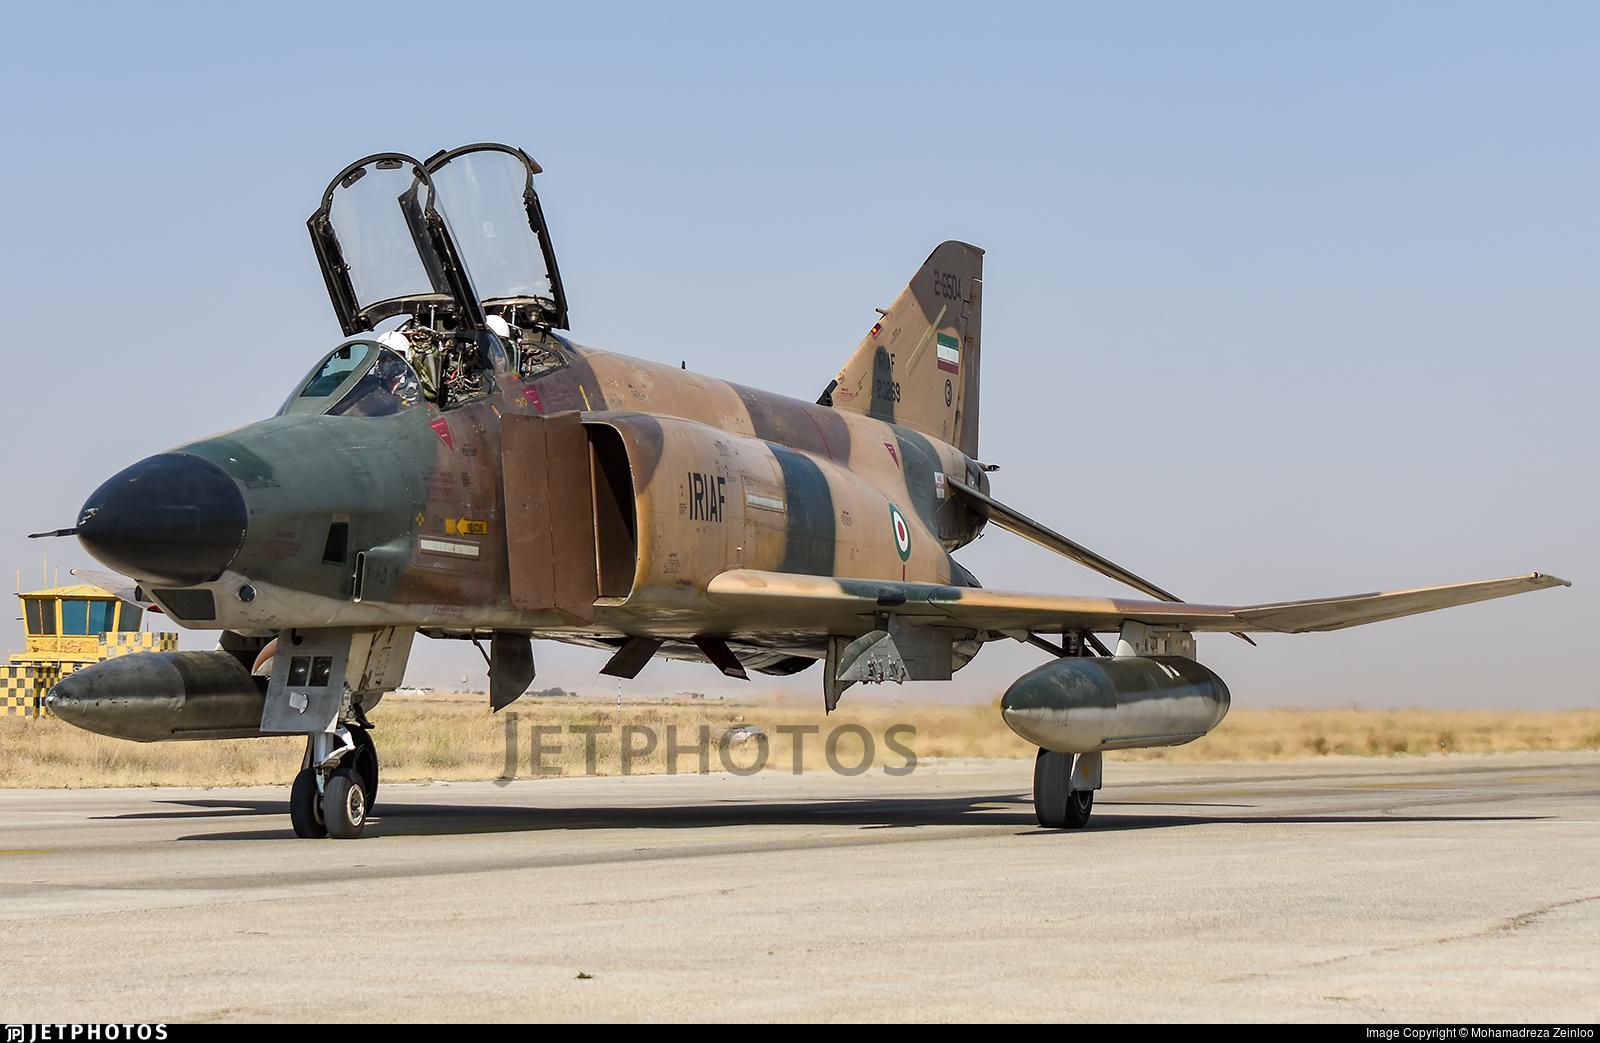 2-6504 - McDonnell Douglas RF-4E Phantom II - Iran - Air Force